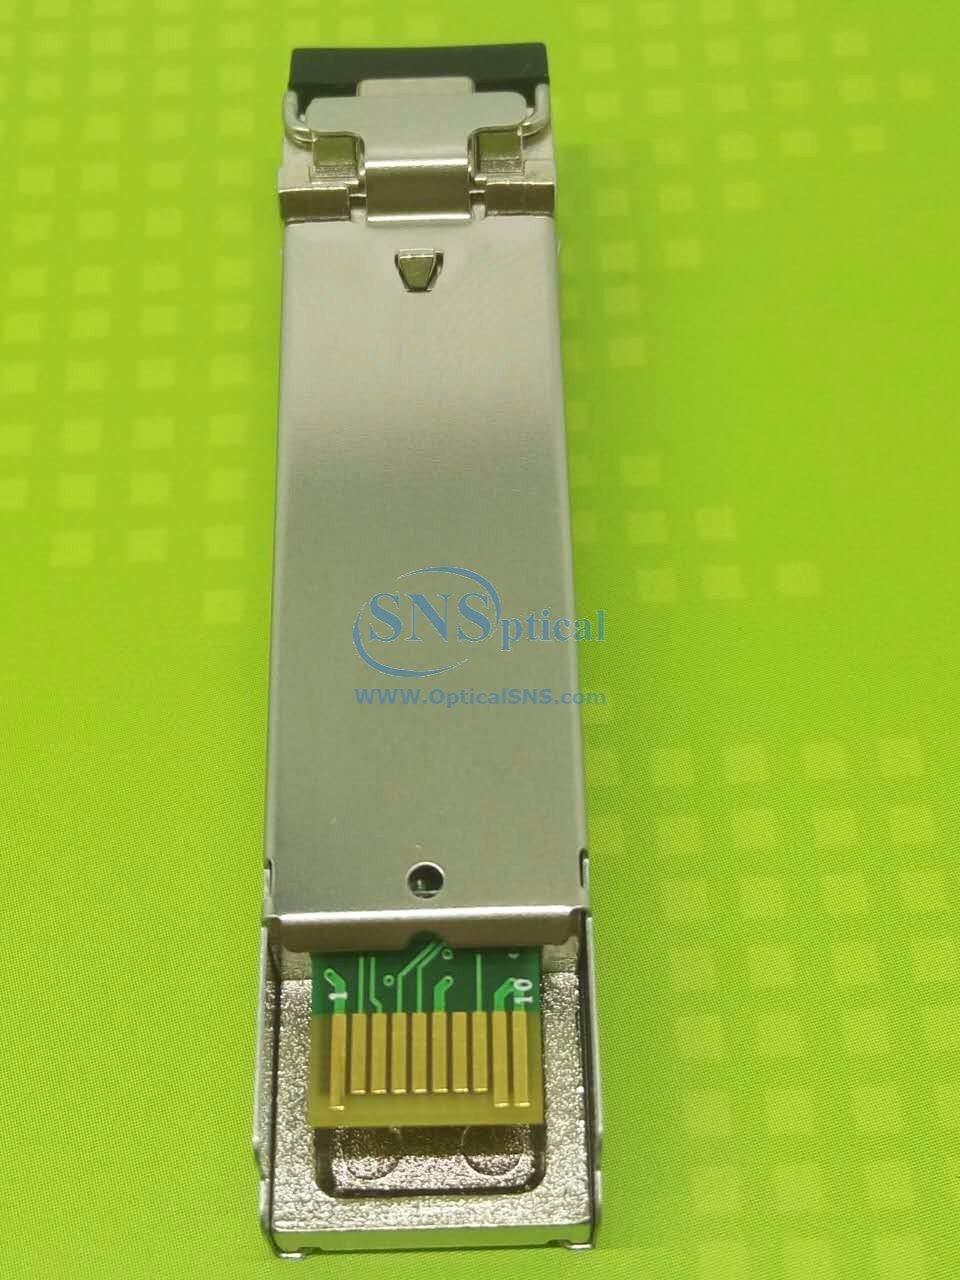 Super X10DGQ 1028GR-TRT only by CMS C123 Super X10DRG-HT 32GB Super X10DRG-H 1028GR-TR Memory Ram Compatible with Supermicro SuperBlade 1028GQ-TXRT 4X8GB